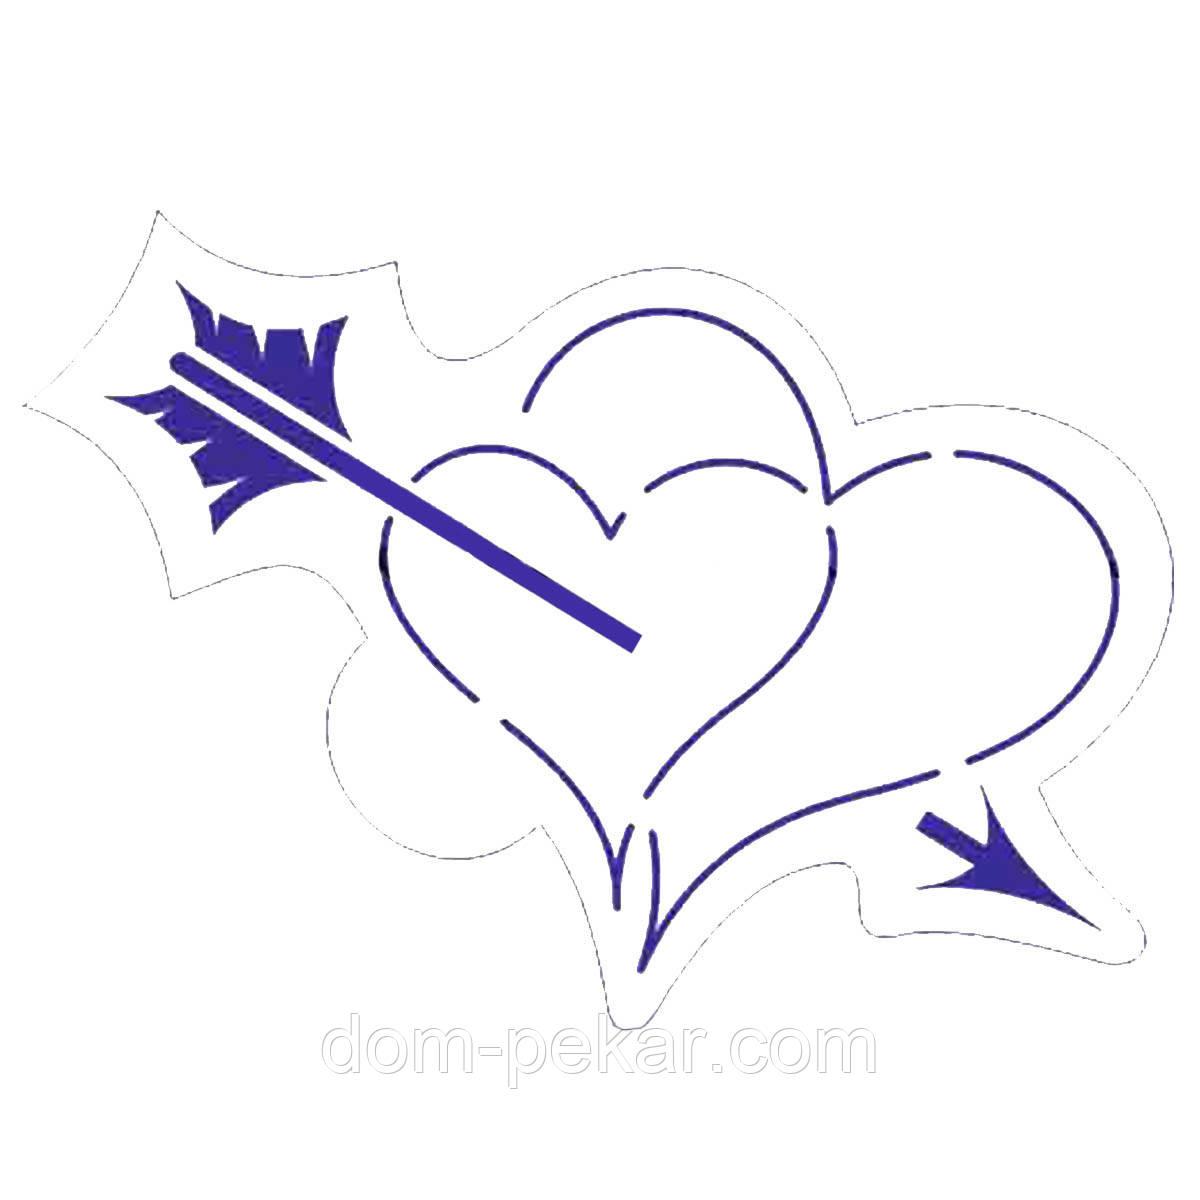 Трафарет Сердца со стрелой 10 см